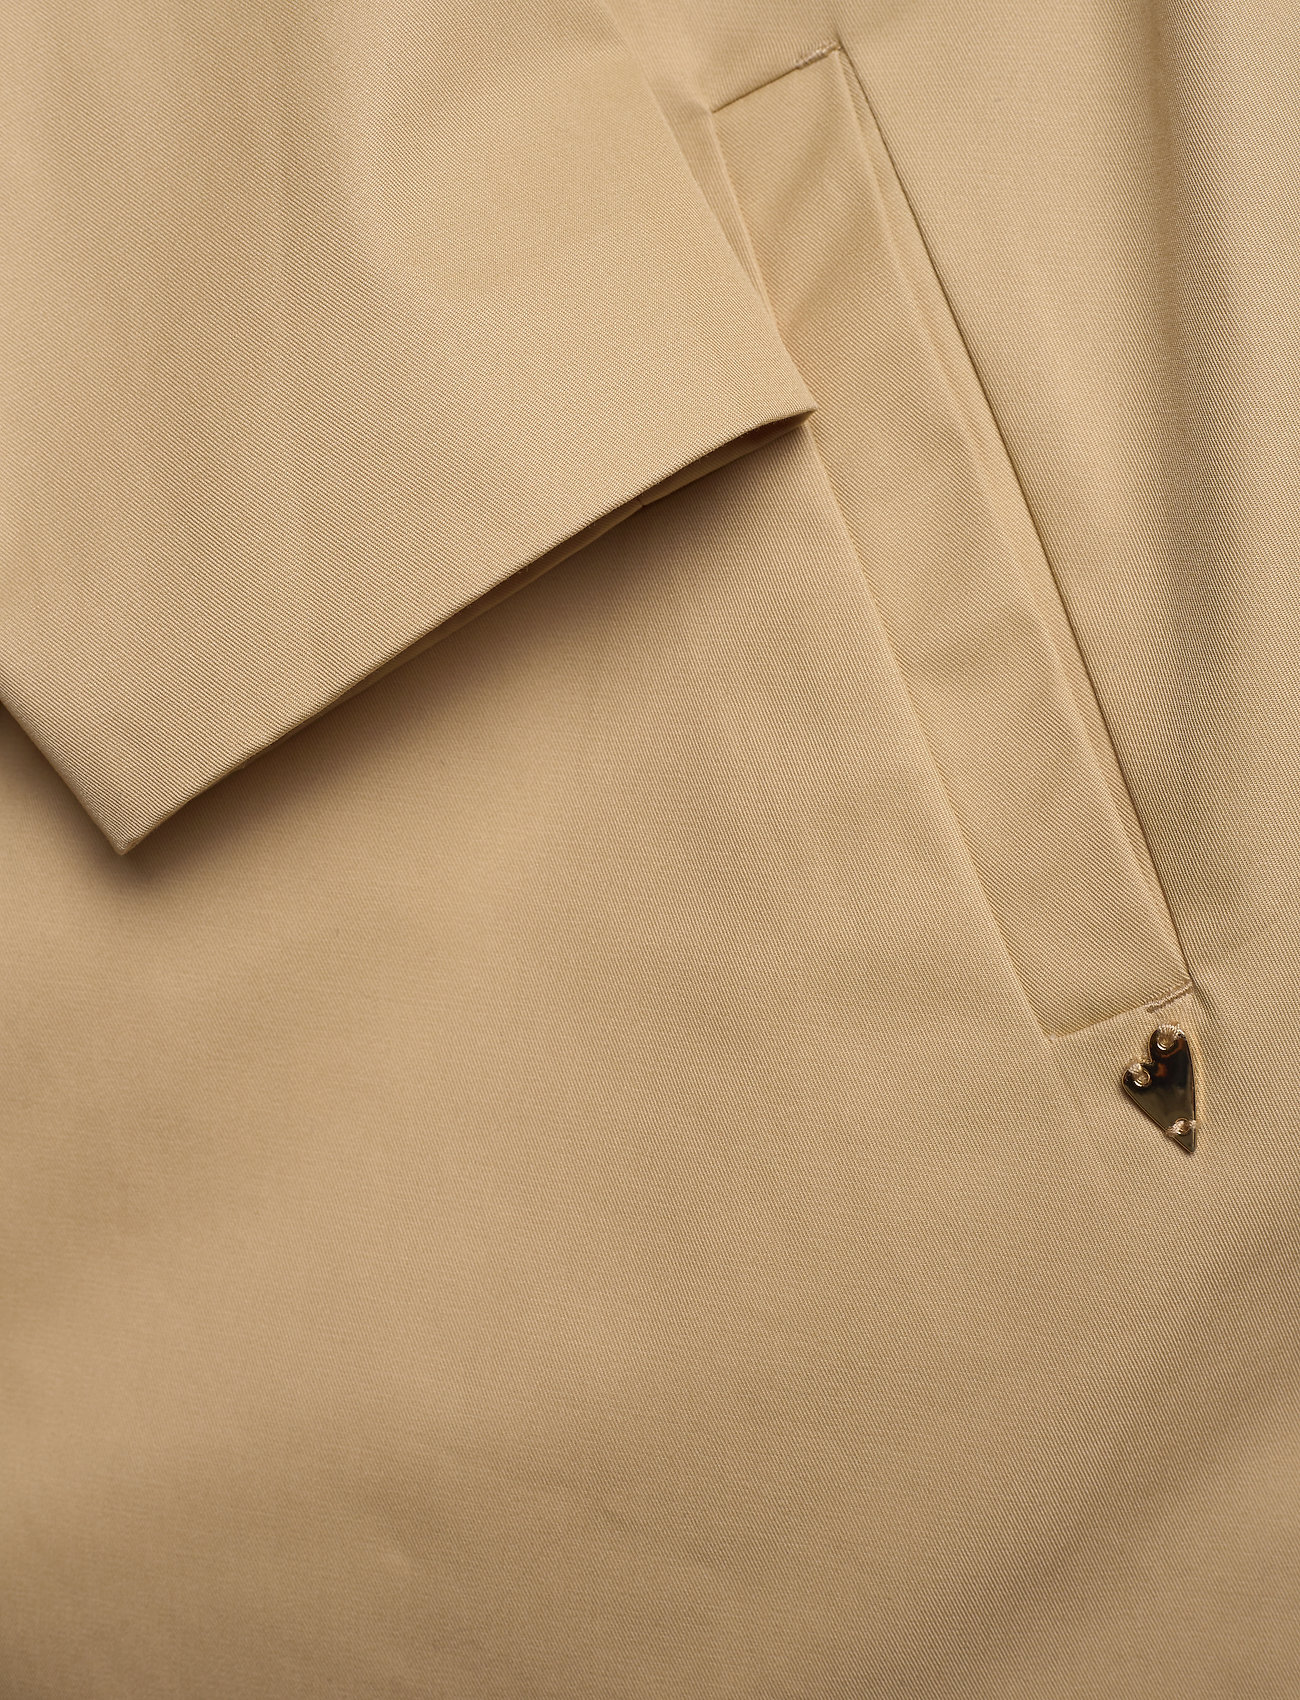 Royce Parca Jacket (Safari) (148.85 €) - MOS MOSH 4ZBYH